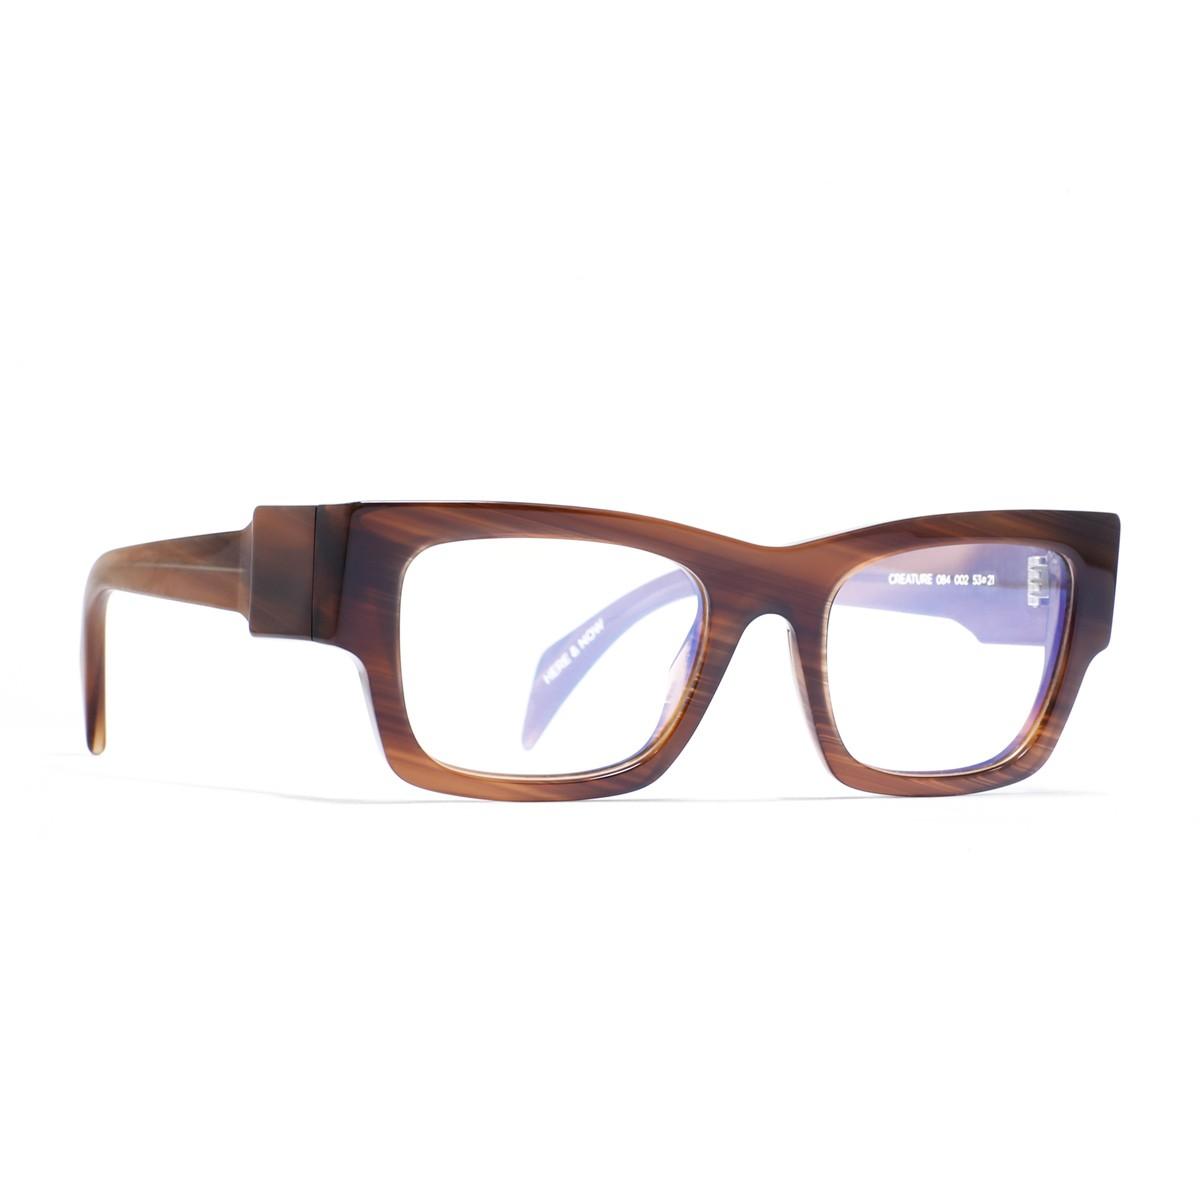 Siens Eye code 084   Occhiali da vista Unisex